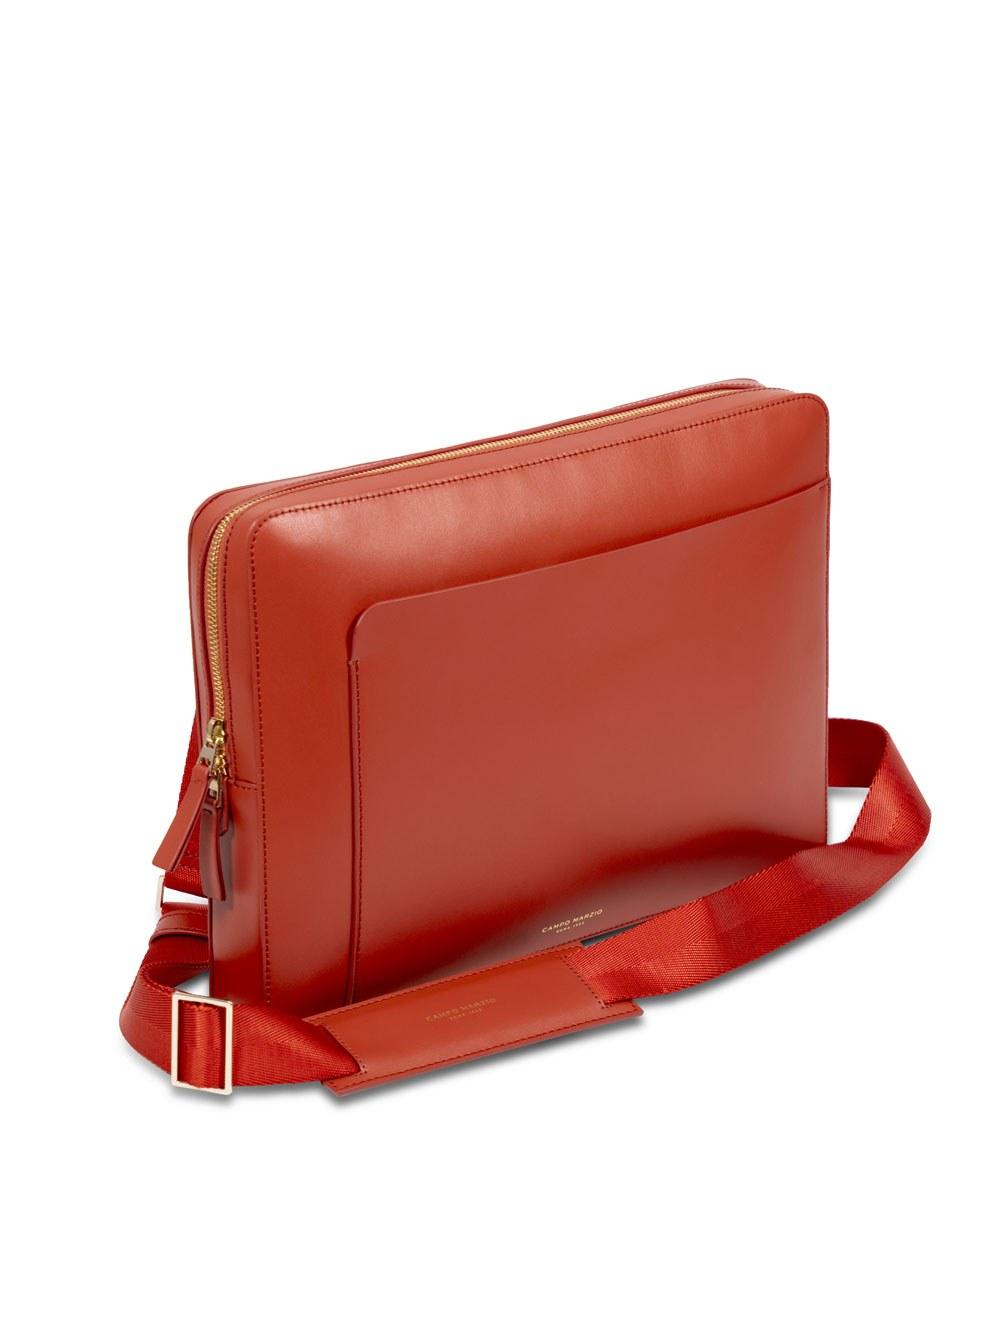 "Laptop Bag 13"" With Crossbody Strap - Tangerine Tango"